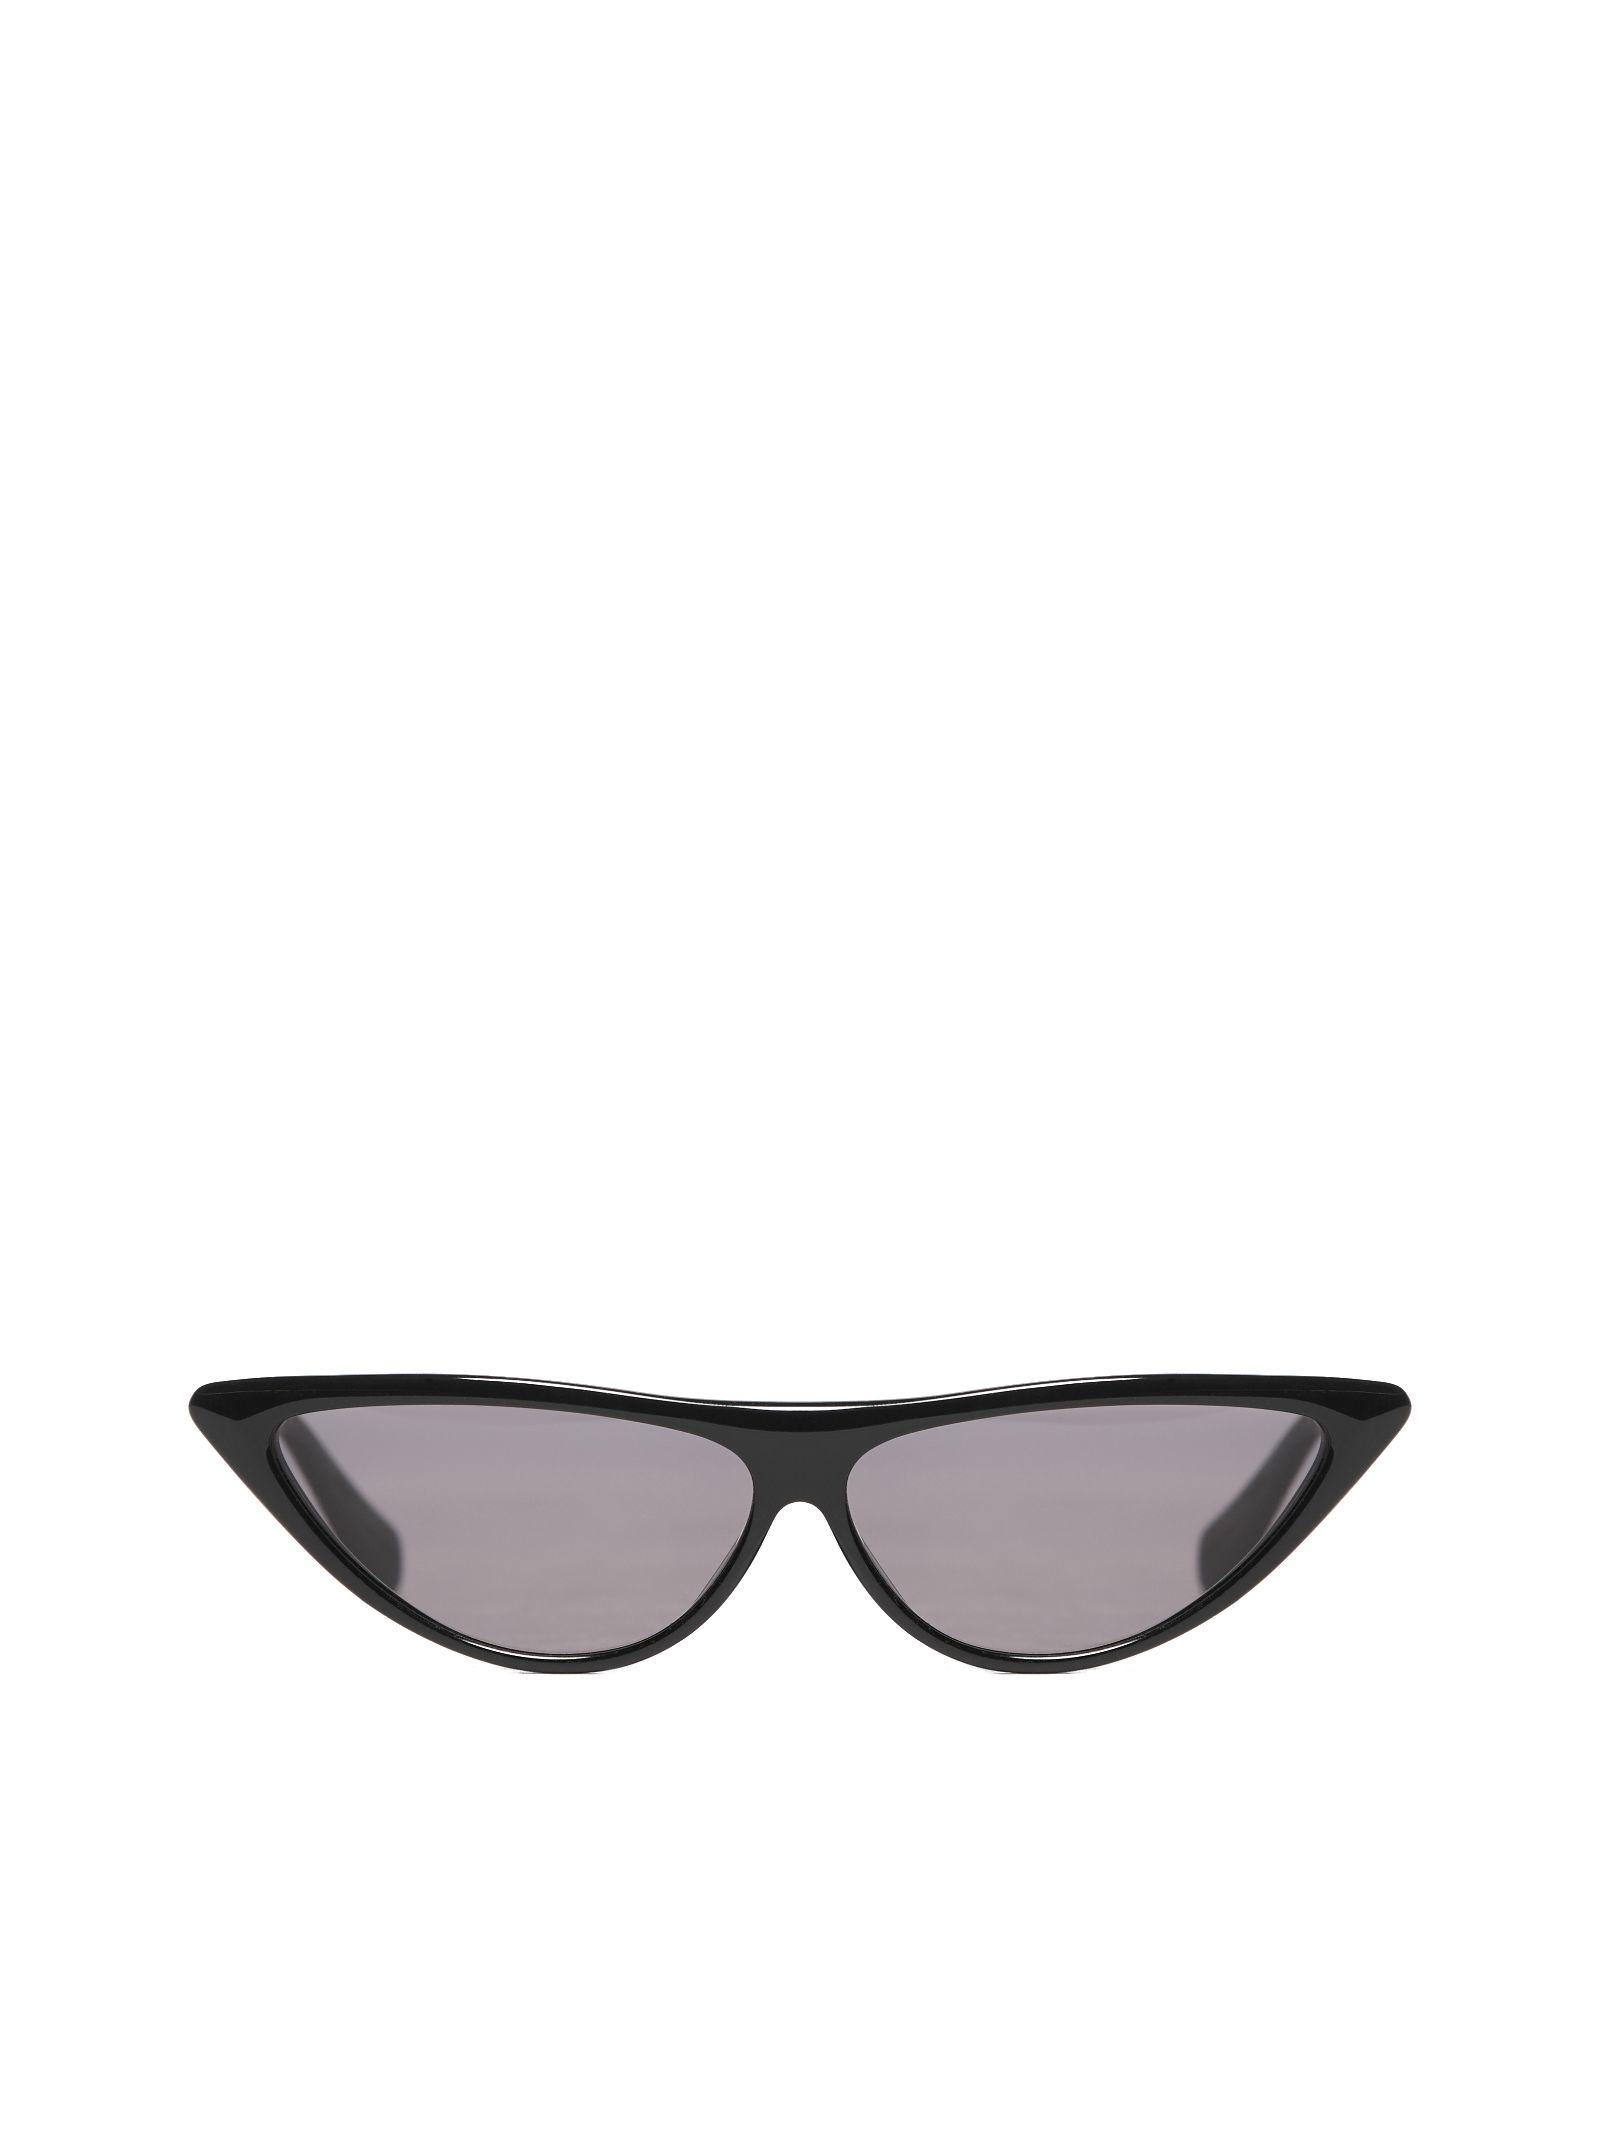 CHRISTIAN ROTH Rina Cat Eye Sunglasses in Nero